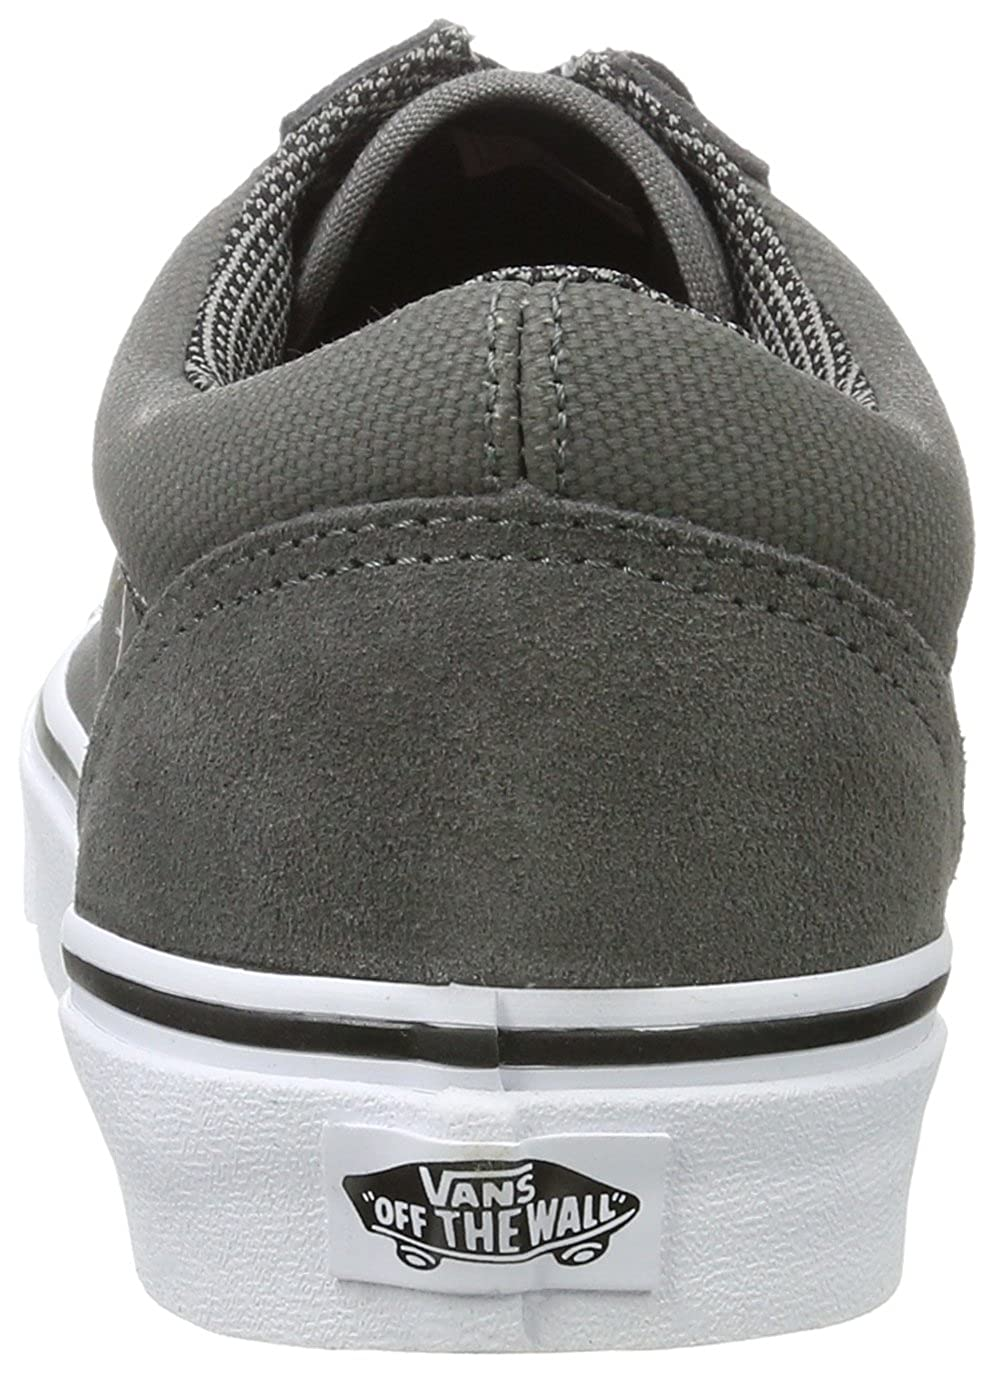 a821d78eceab1f Vans Men s s Old Skool Trainers  Amazon.co.uk  Shoes   Bags